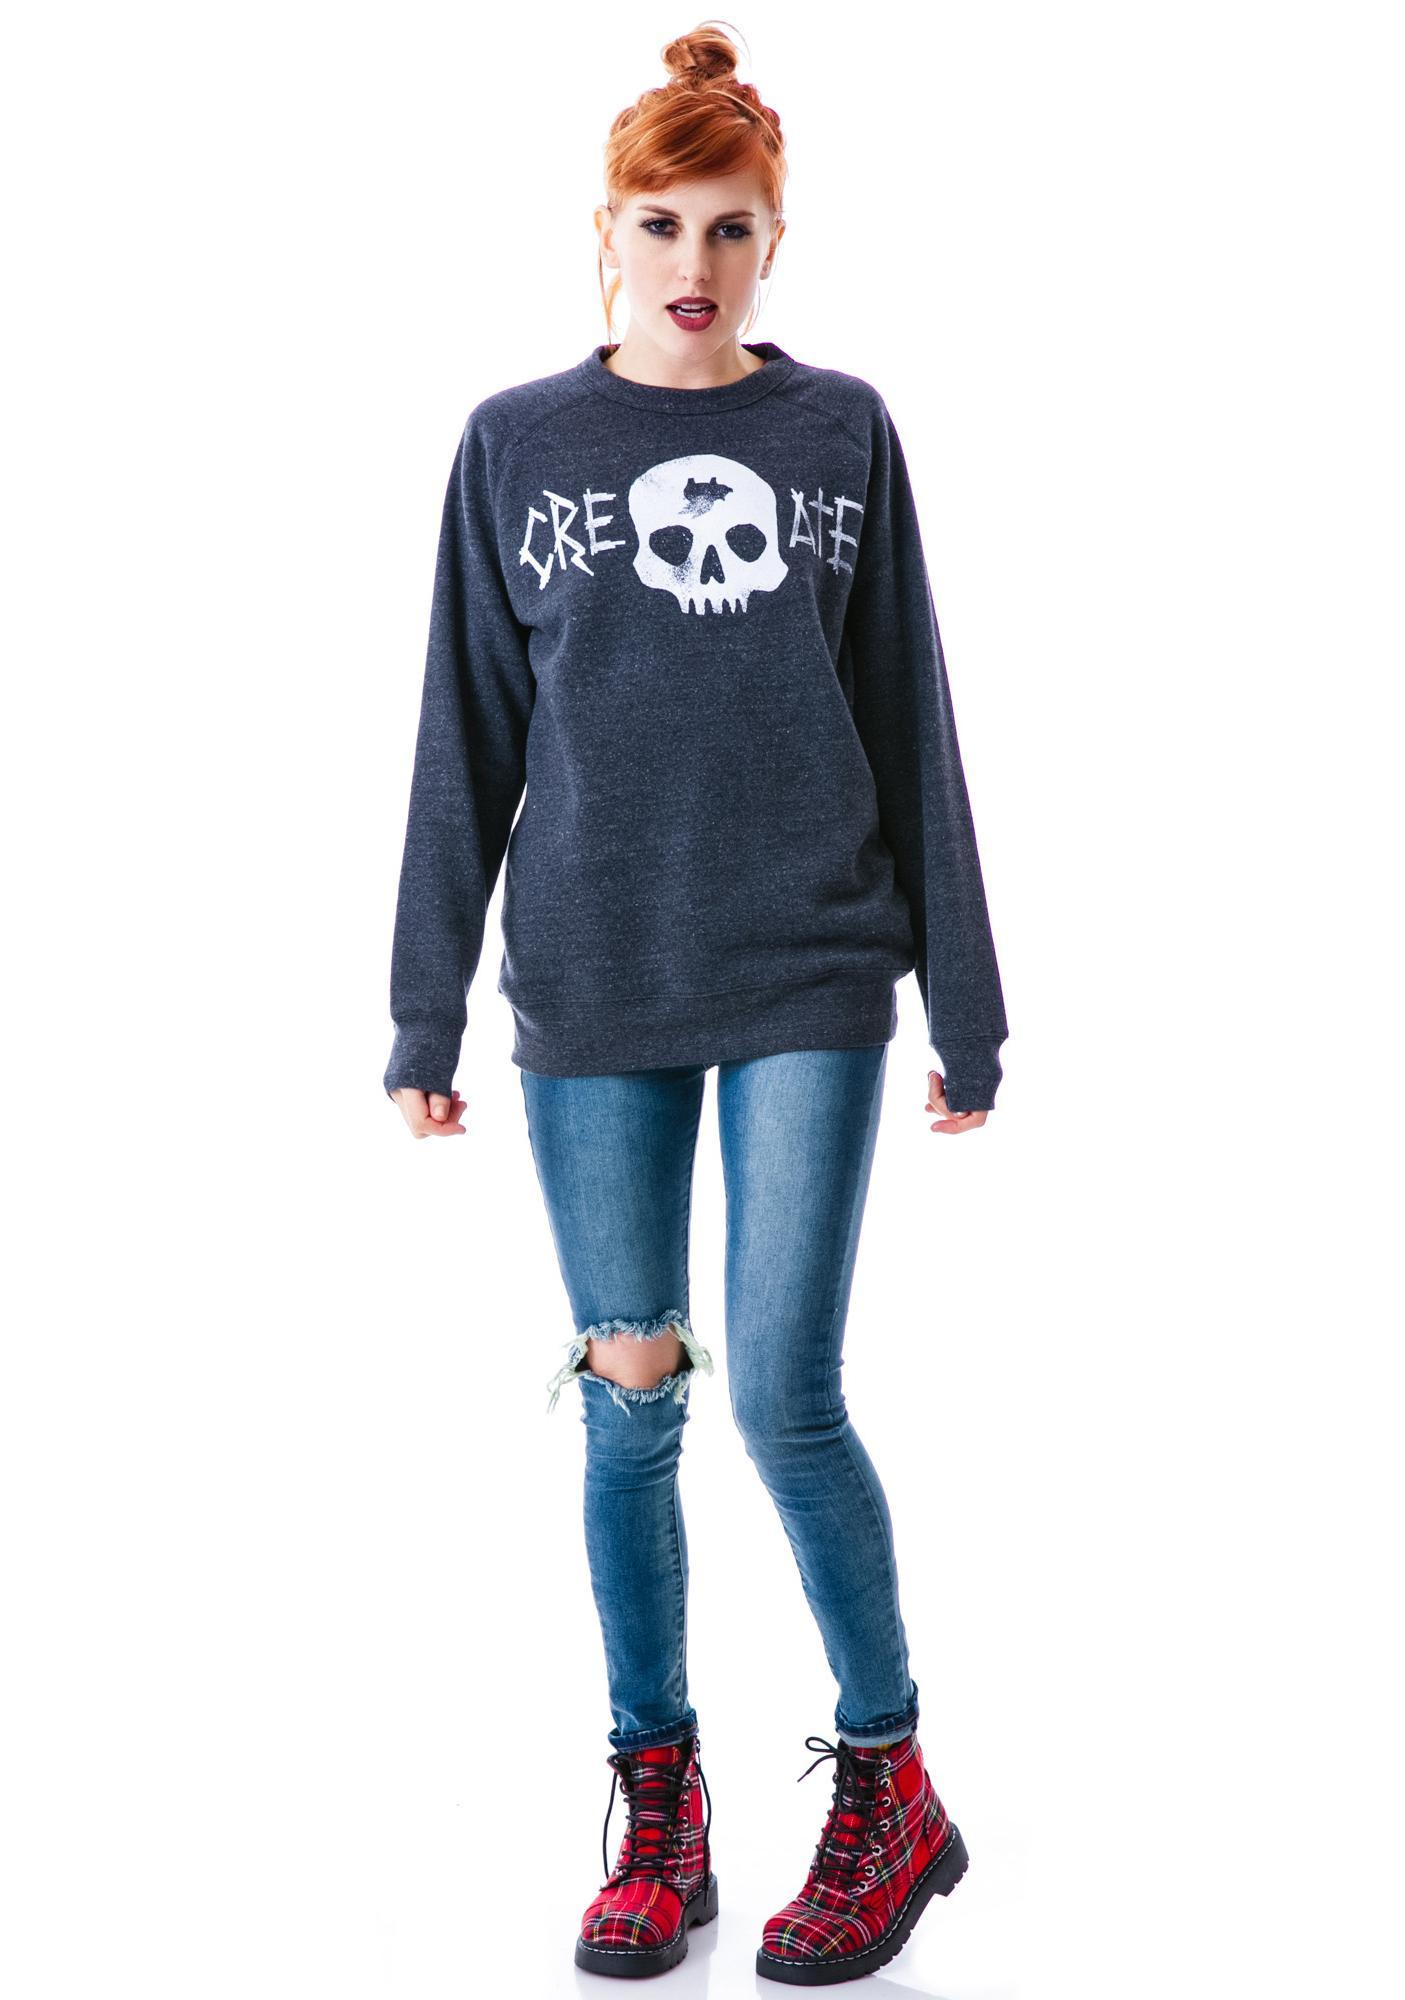 Glamour Kills Use Your Head Crew Sweatshirt